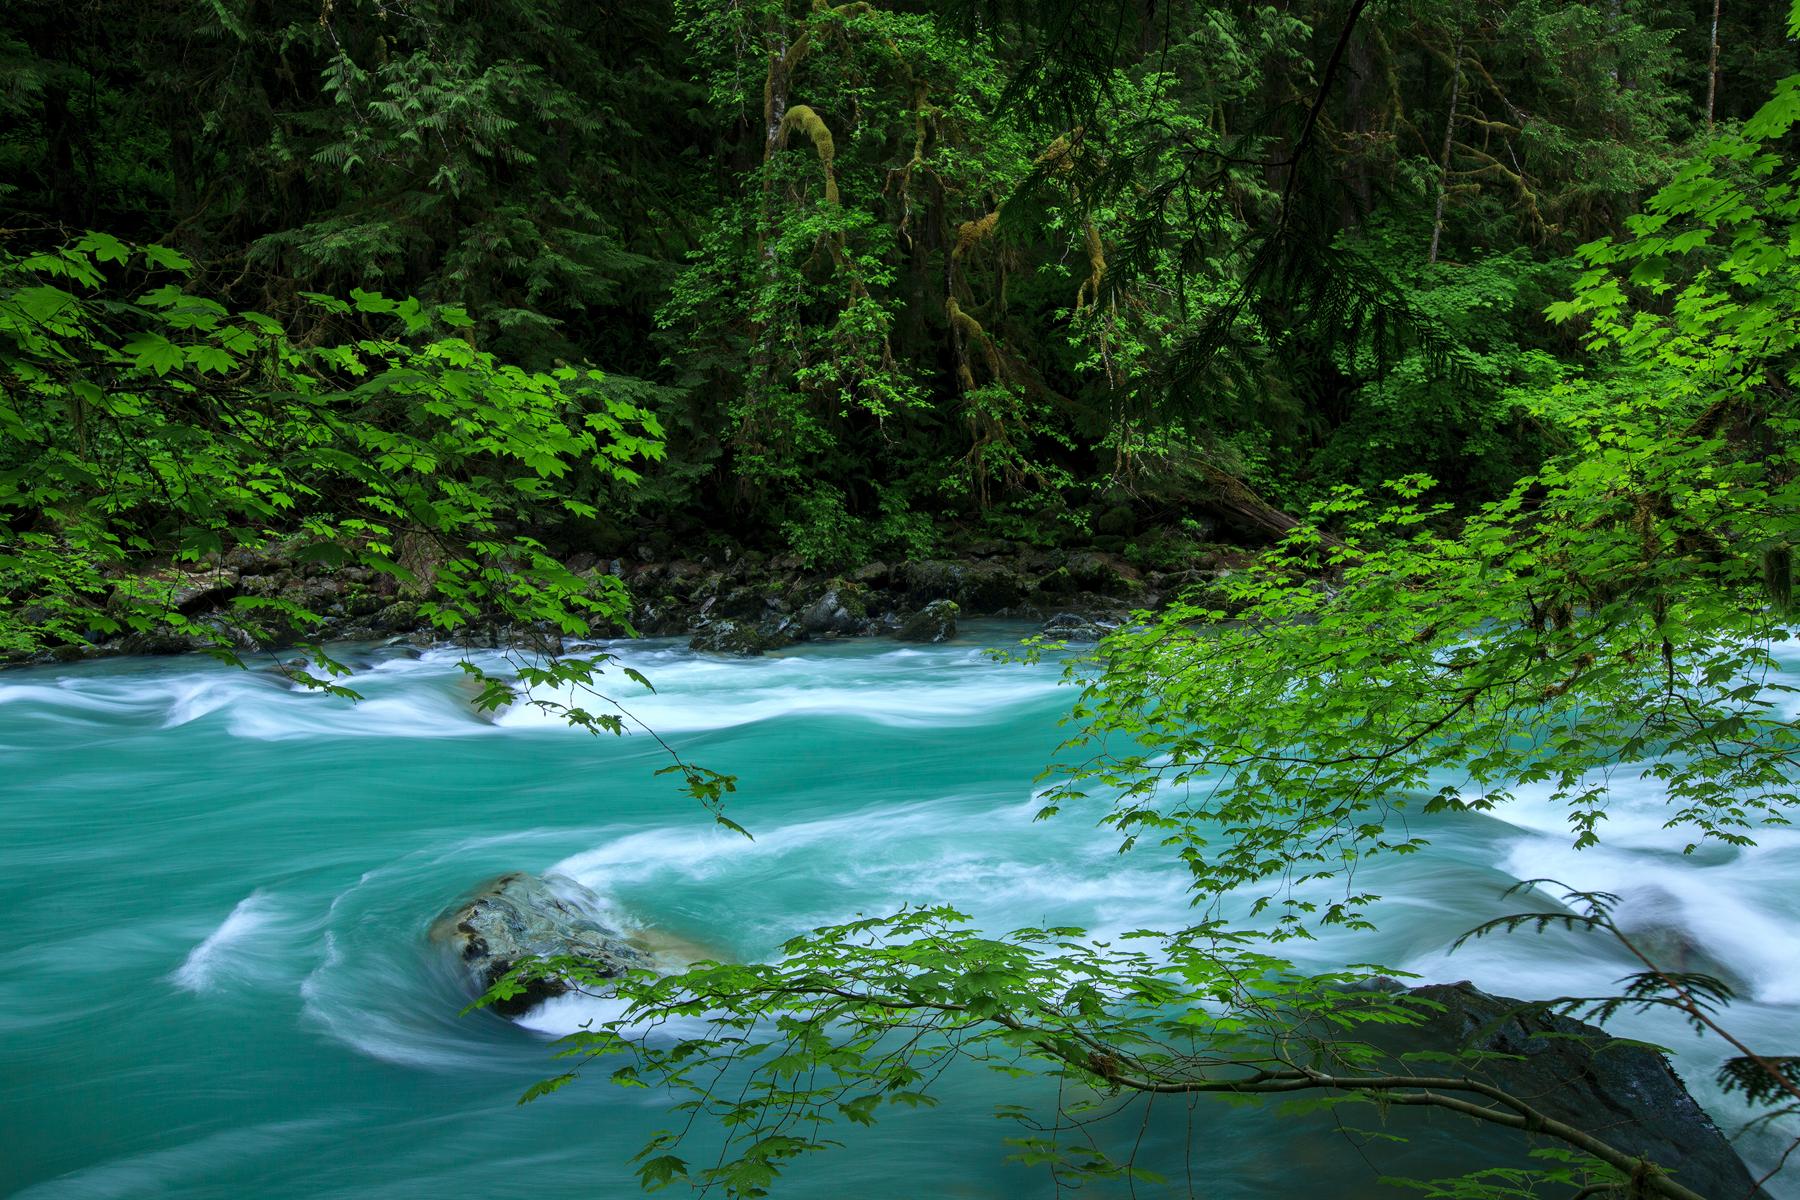 Glacial melt water flows through the rainforest in Washington's Mount Baker wilderness.  Image ©Connor Stefanison